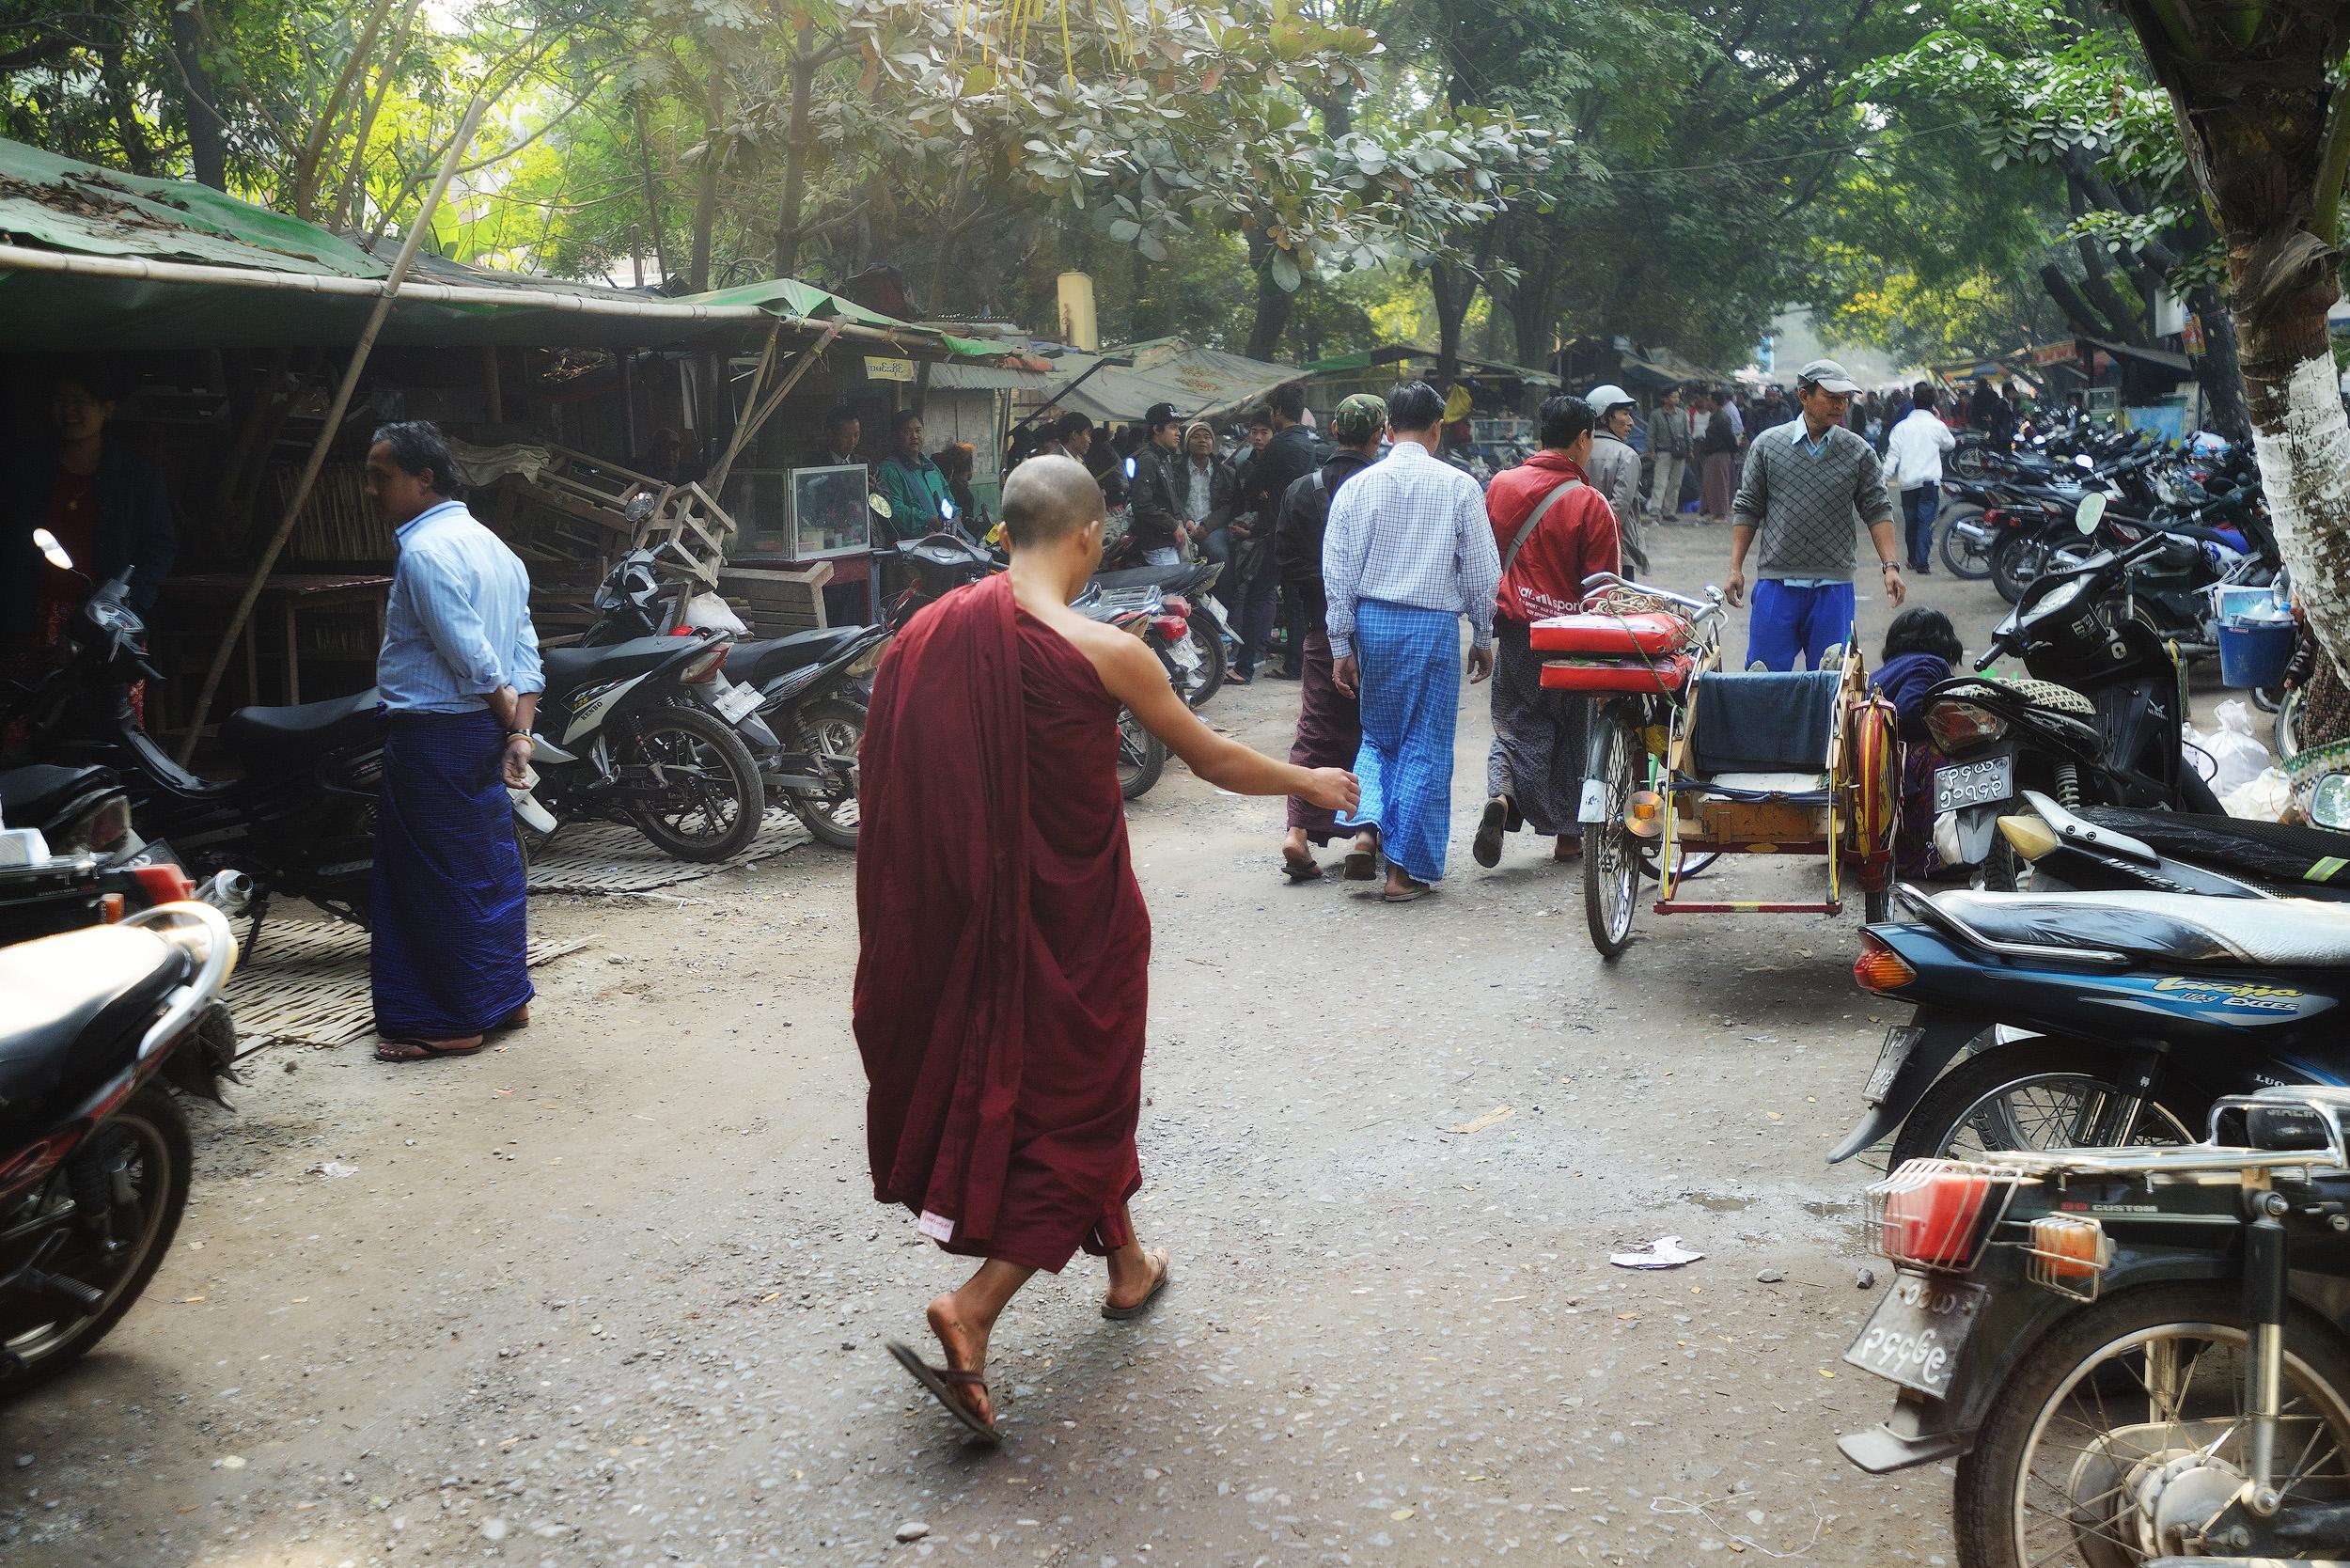 The Jade Market   A monk walks through the hurly burly of the jade market in Mandalay